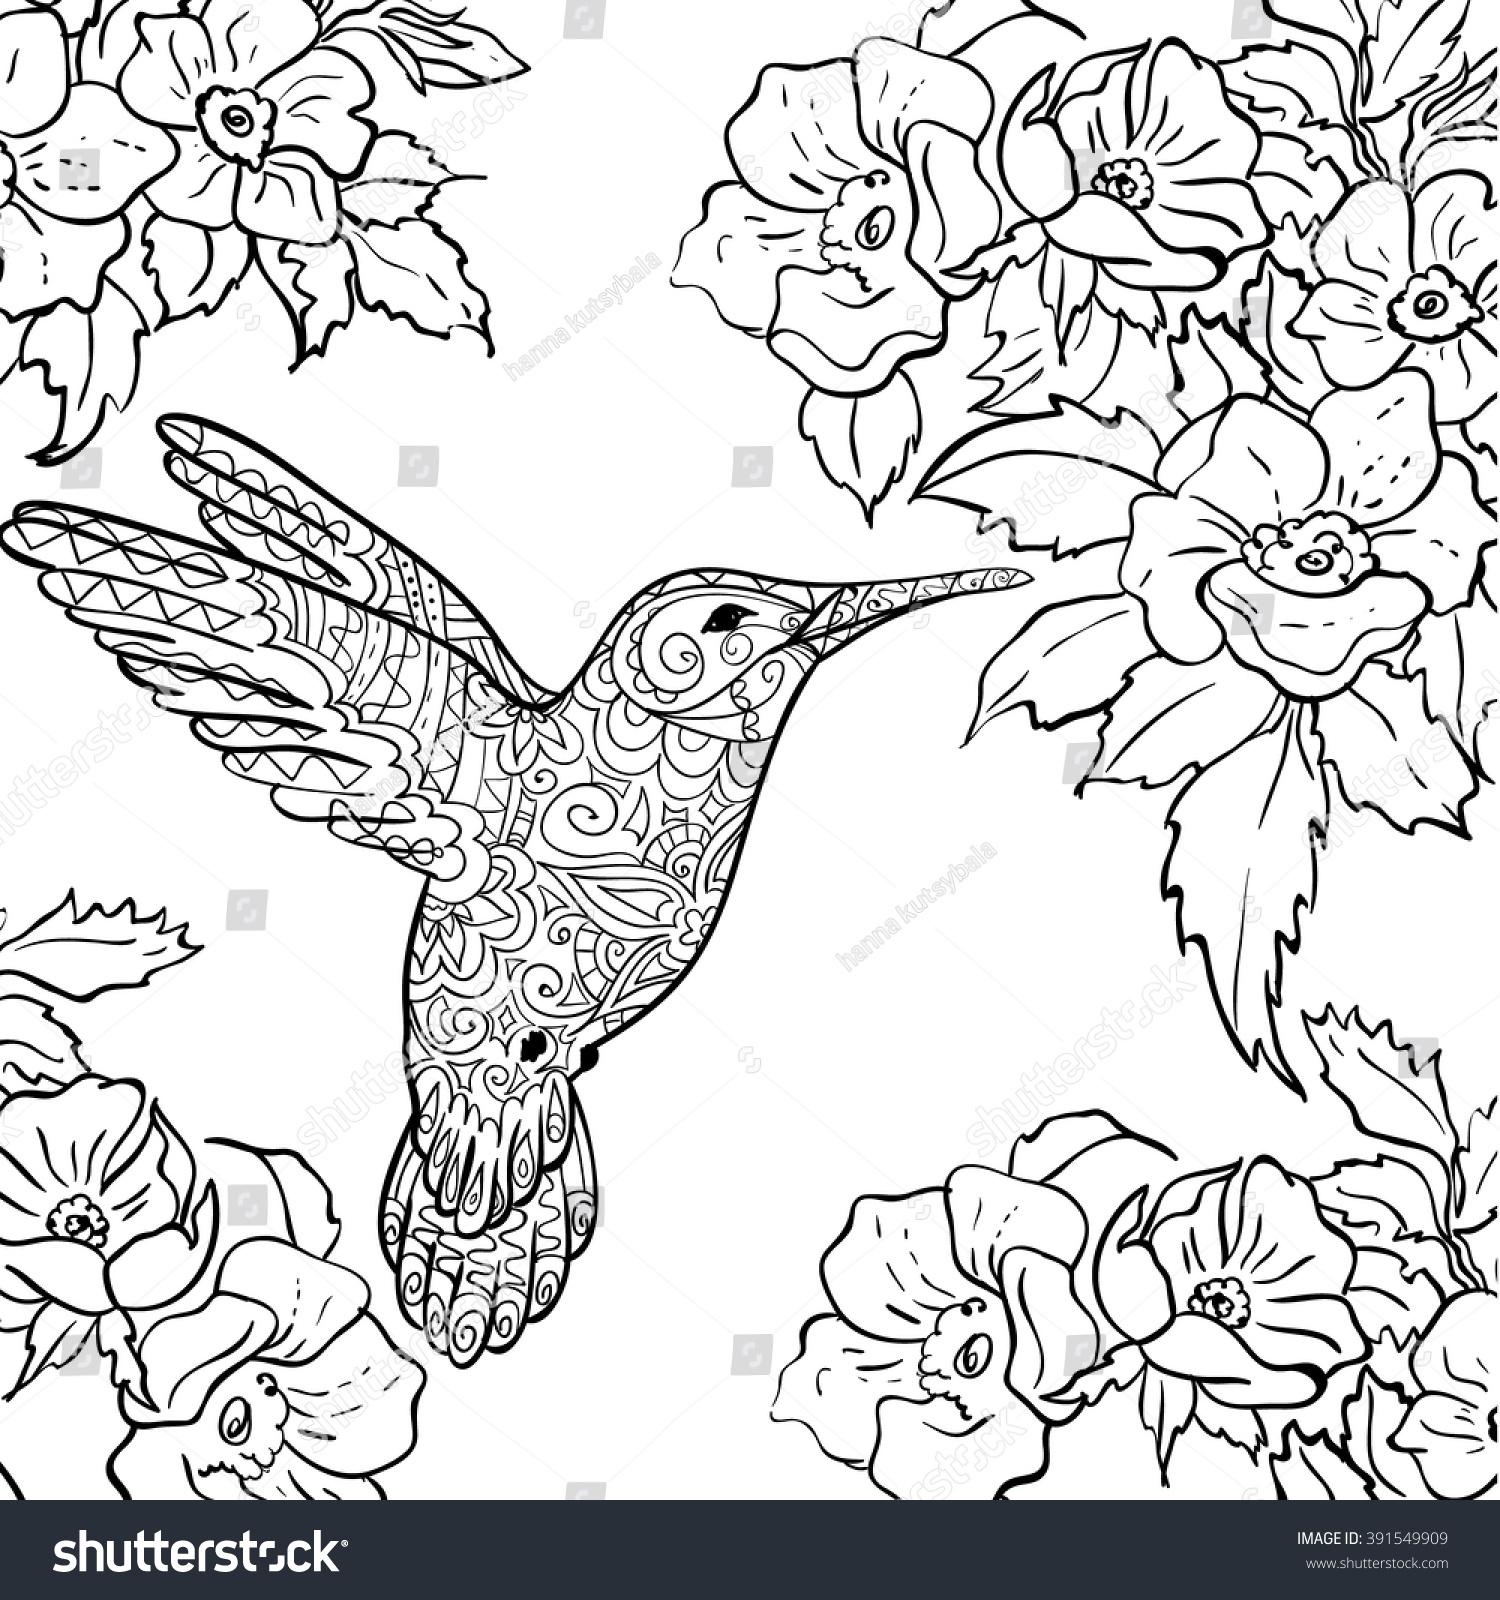 sketch hummingbird flying around flowers full stock vector